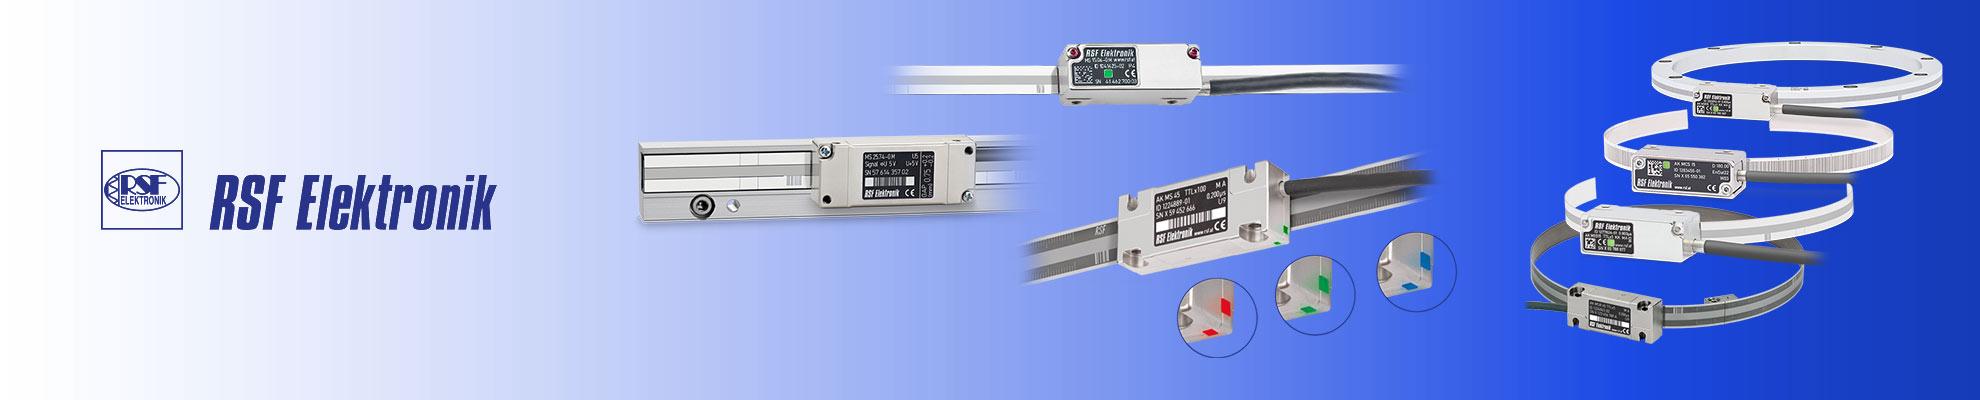 RSF Electronik